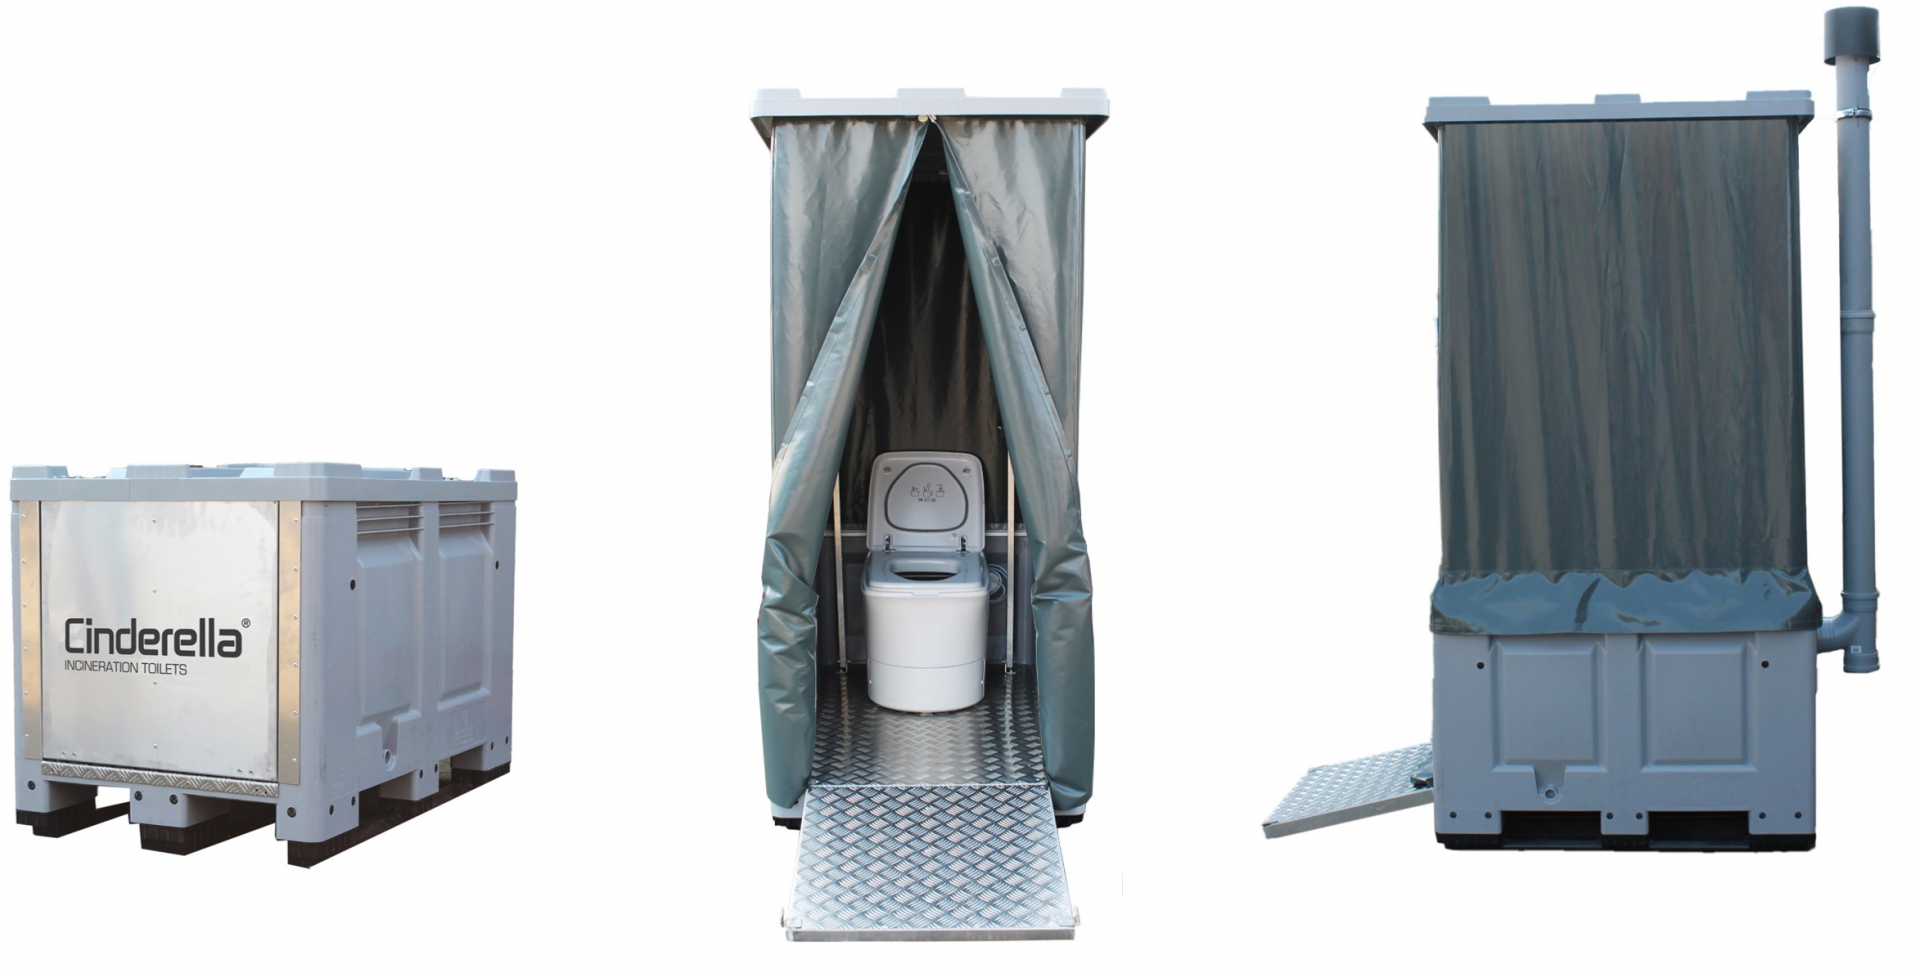 Toilettes seches a incineration cinderella toilettes mobiles